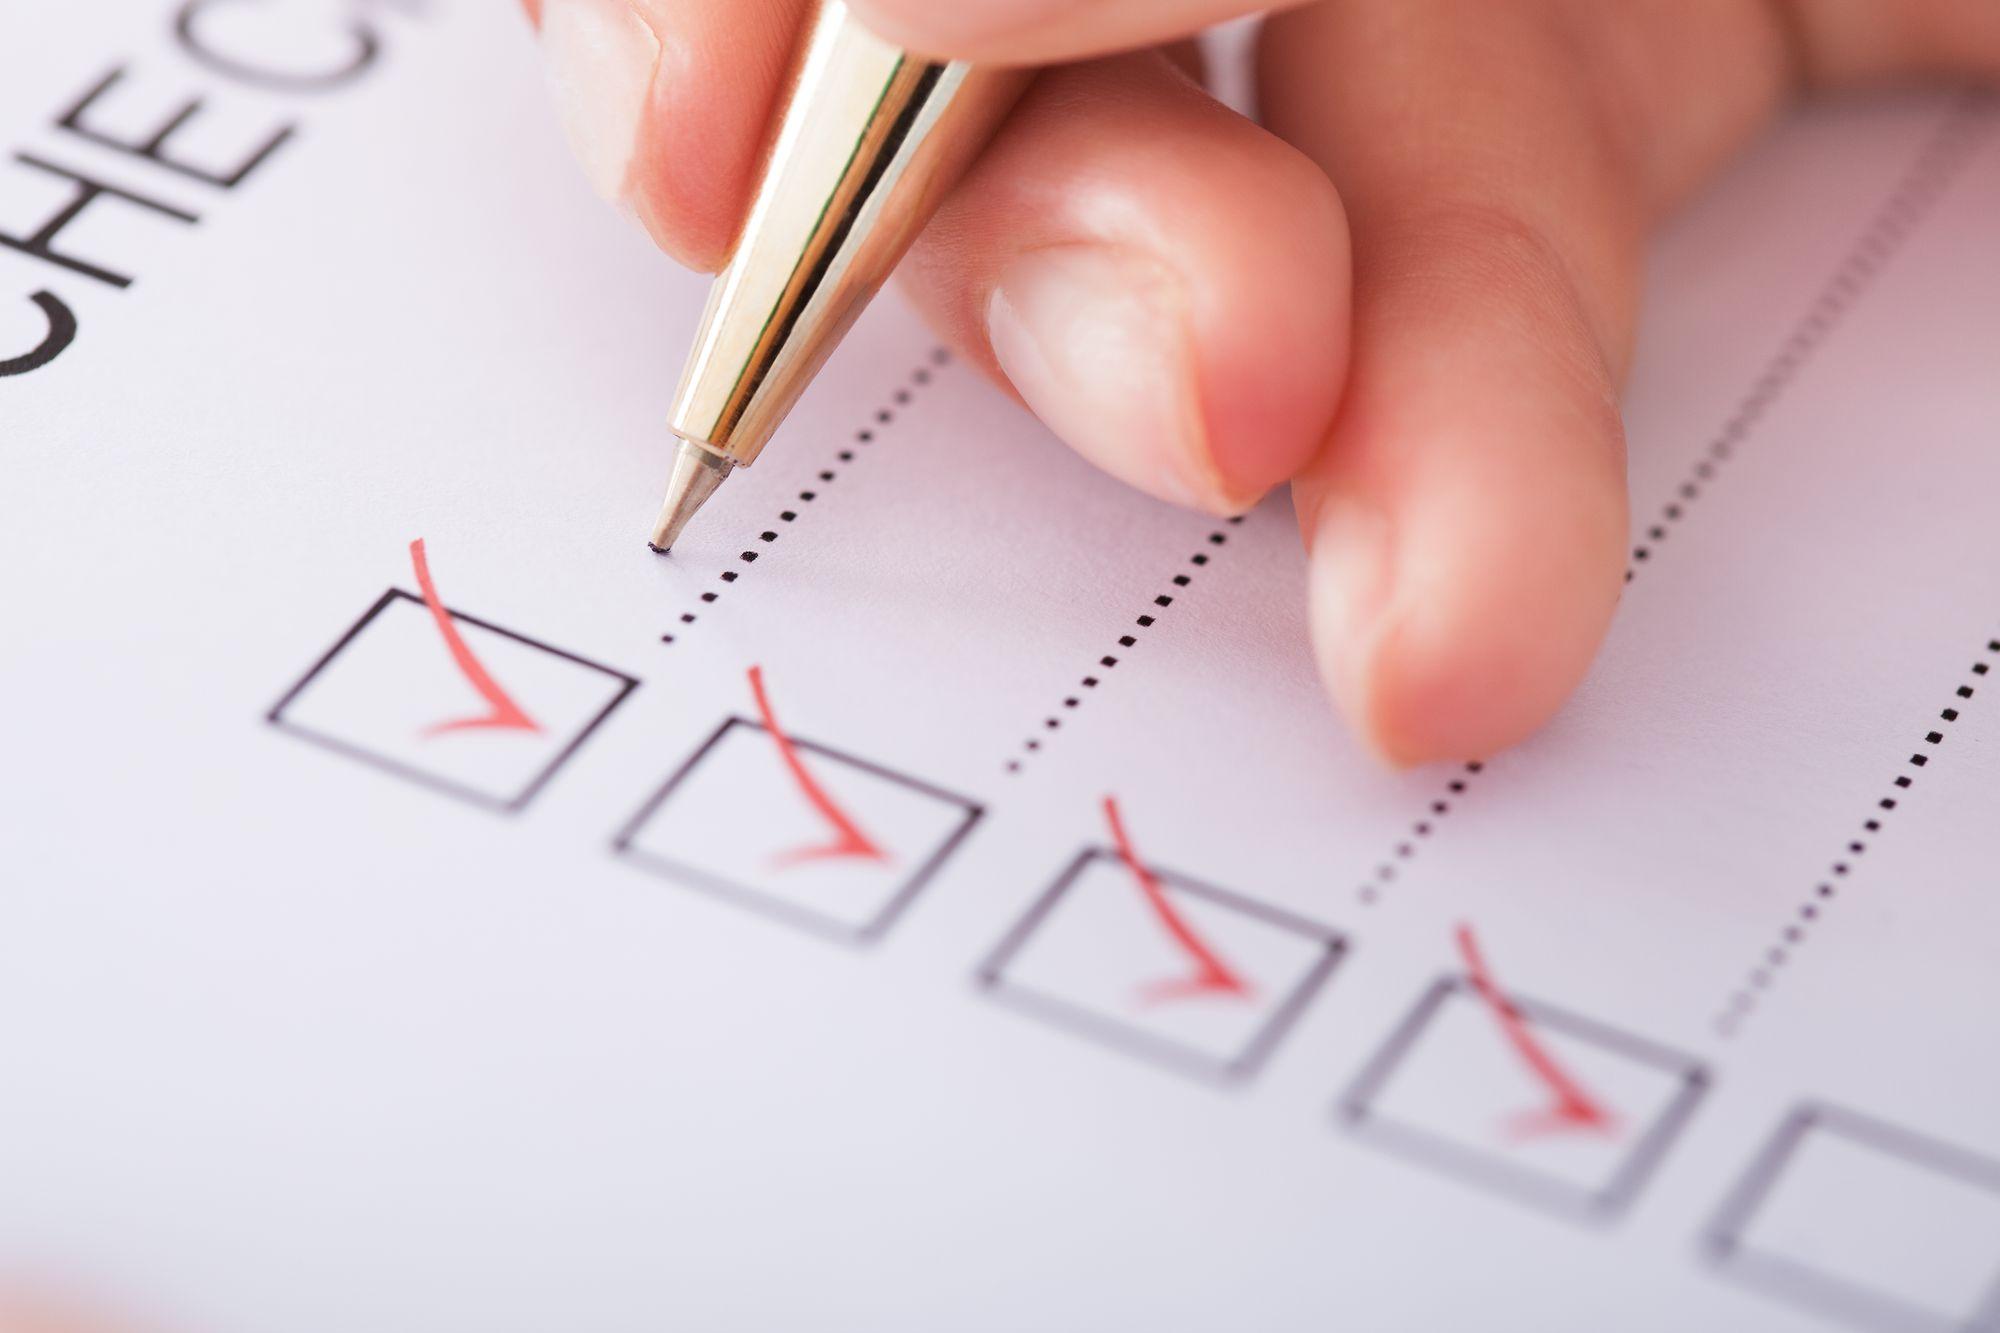 Testing and maintenance checklist